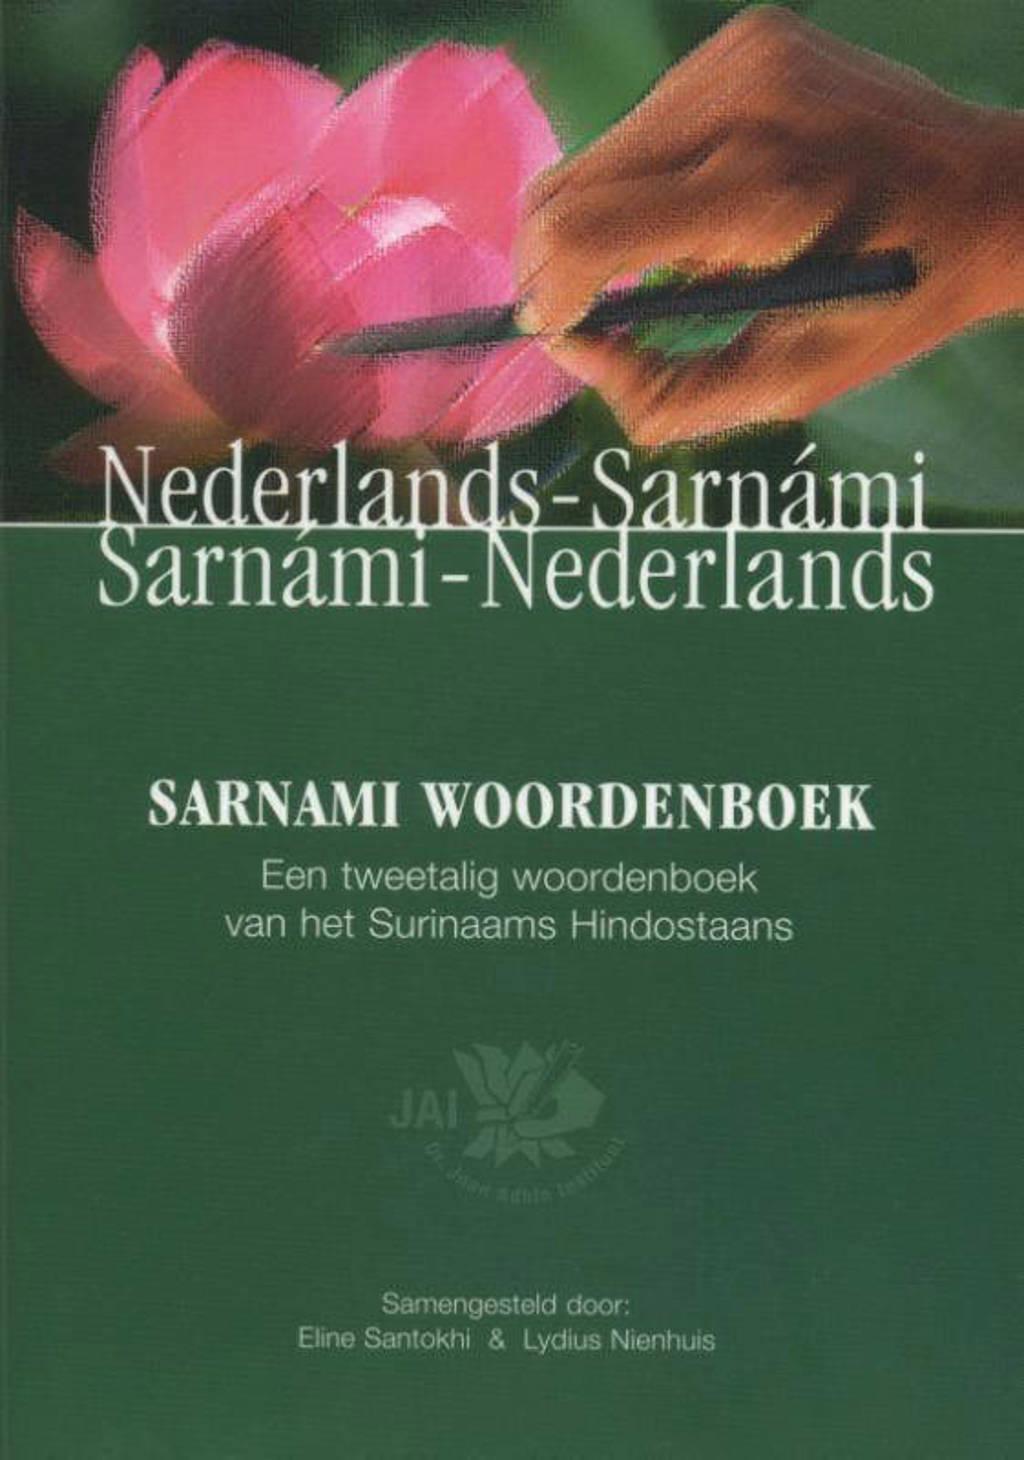 Sarnami woordenboek - E. Santokhi